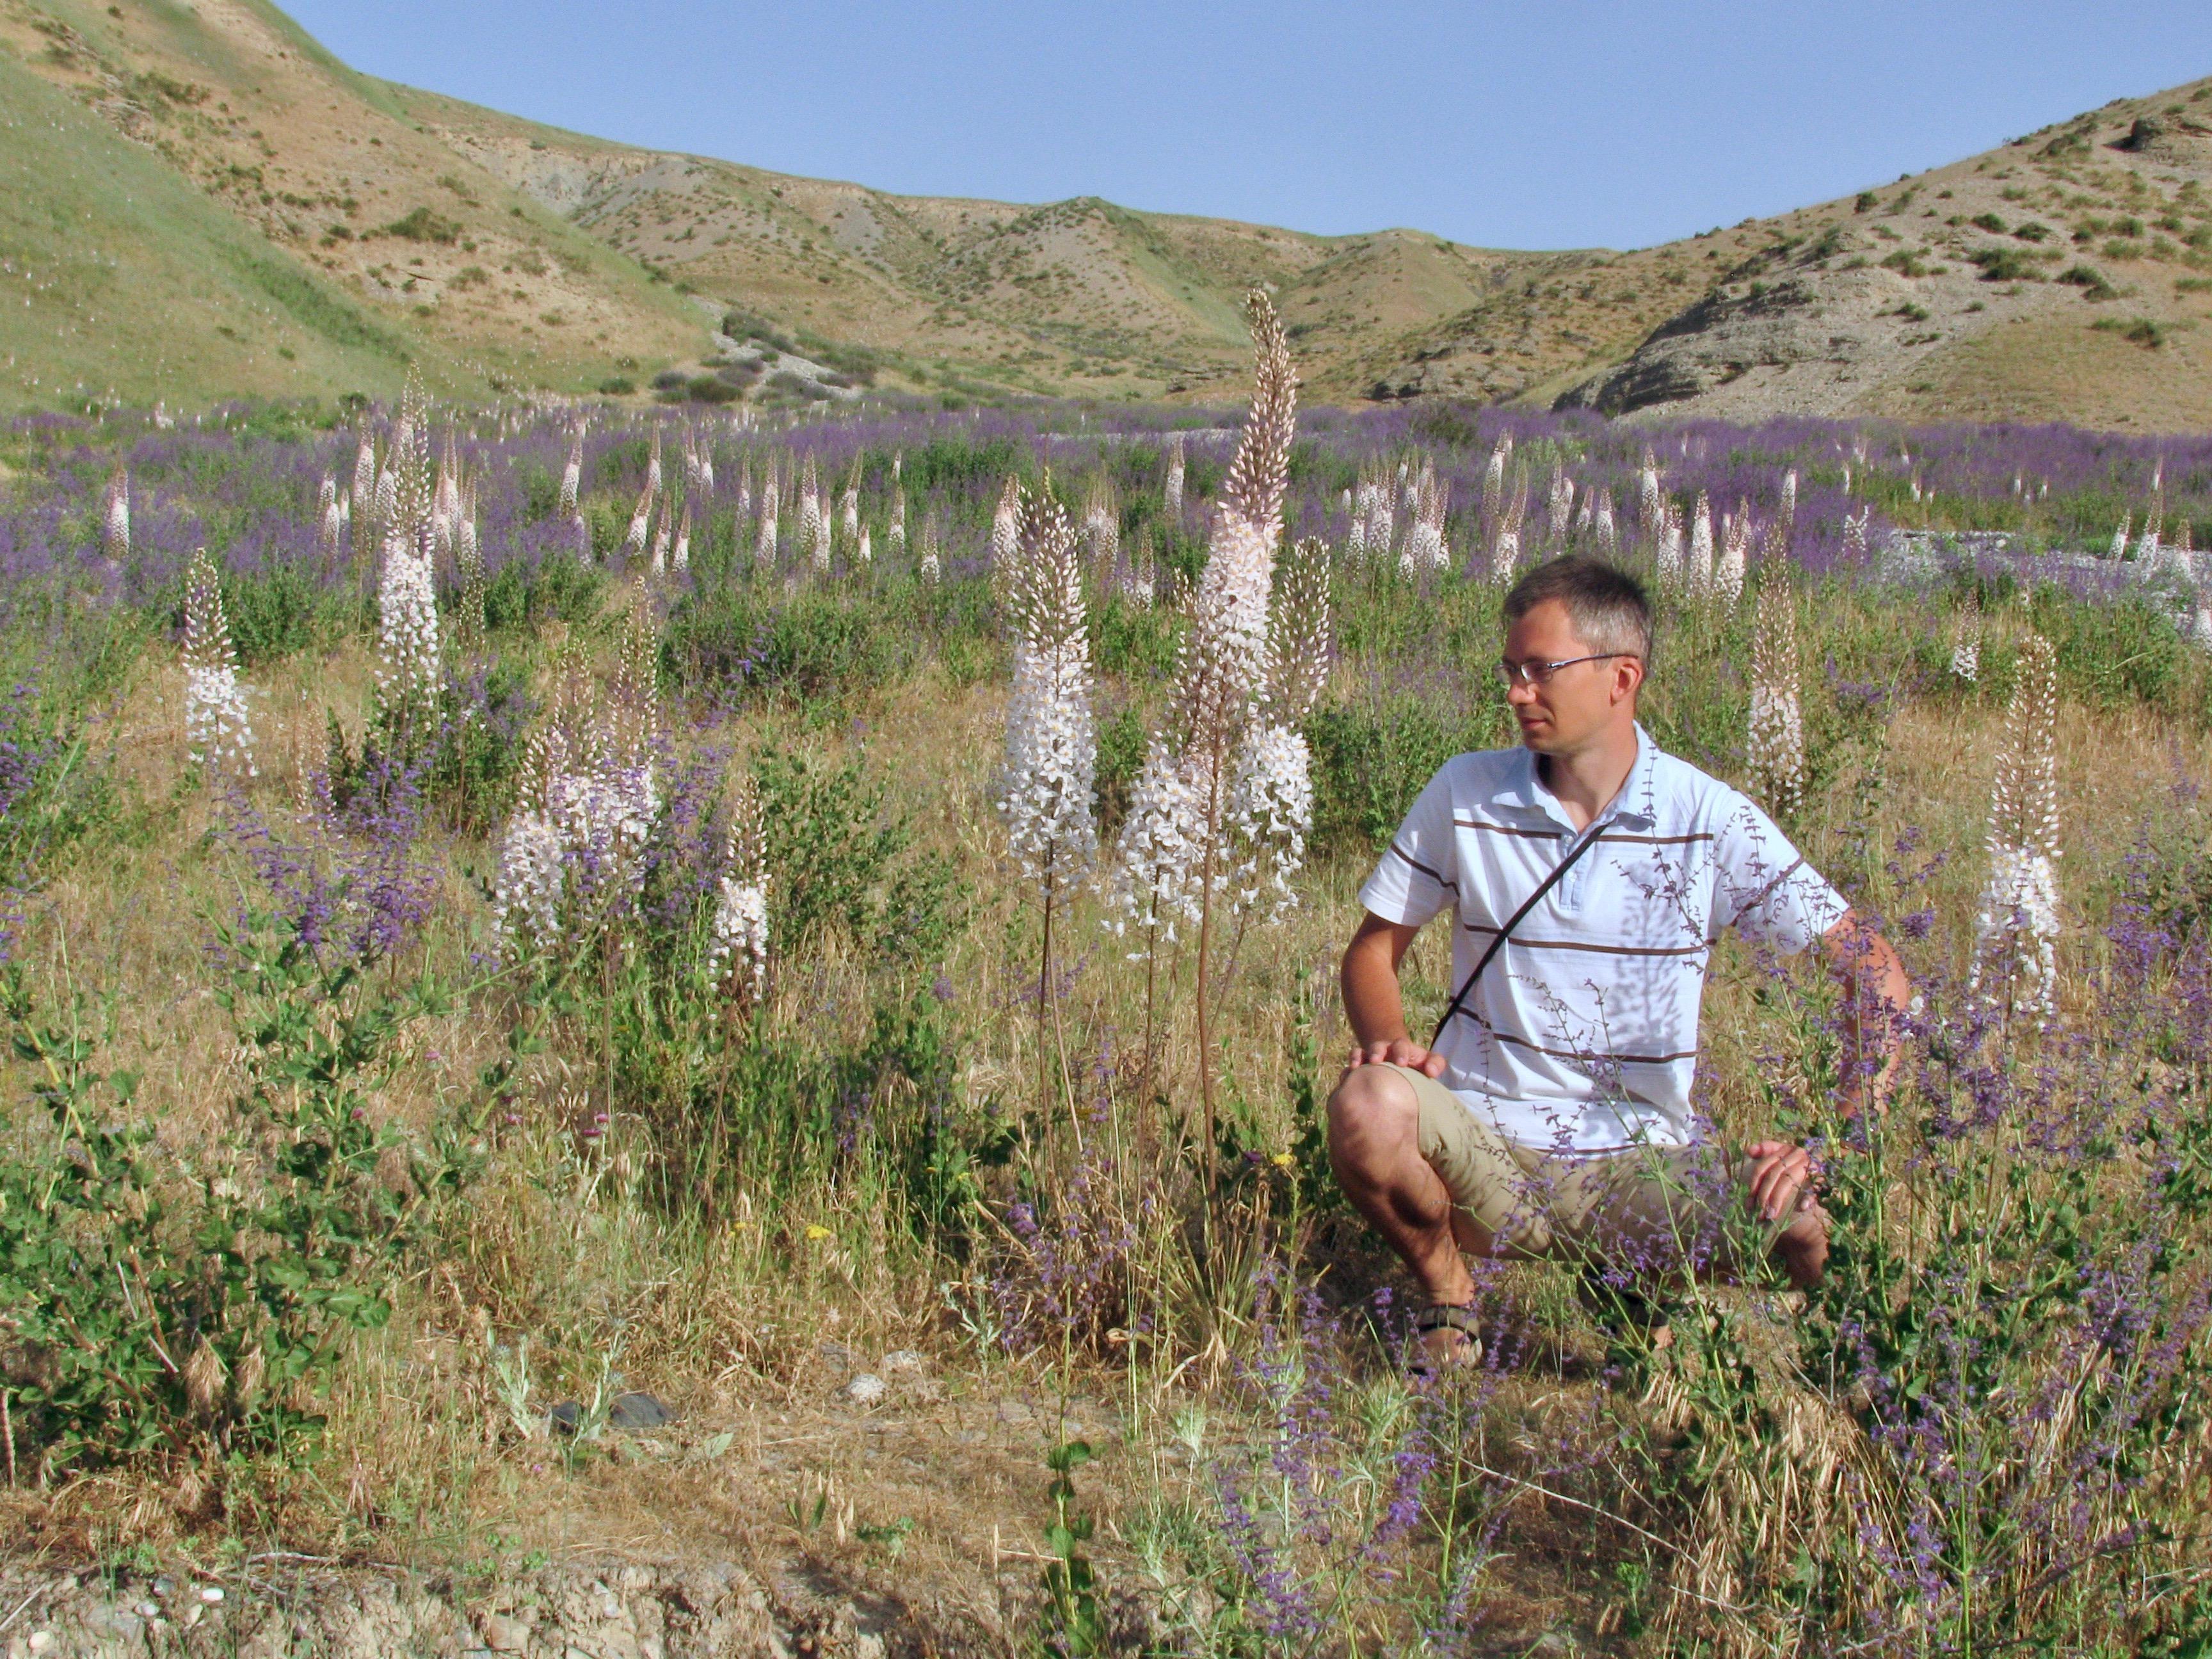 Eremurus tianschanicus, Perovskia scrophulariifolia (lilac) and me